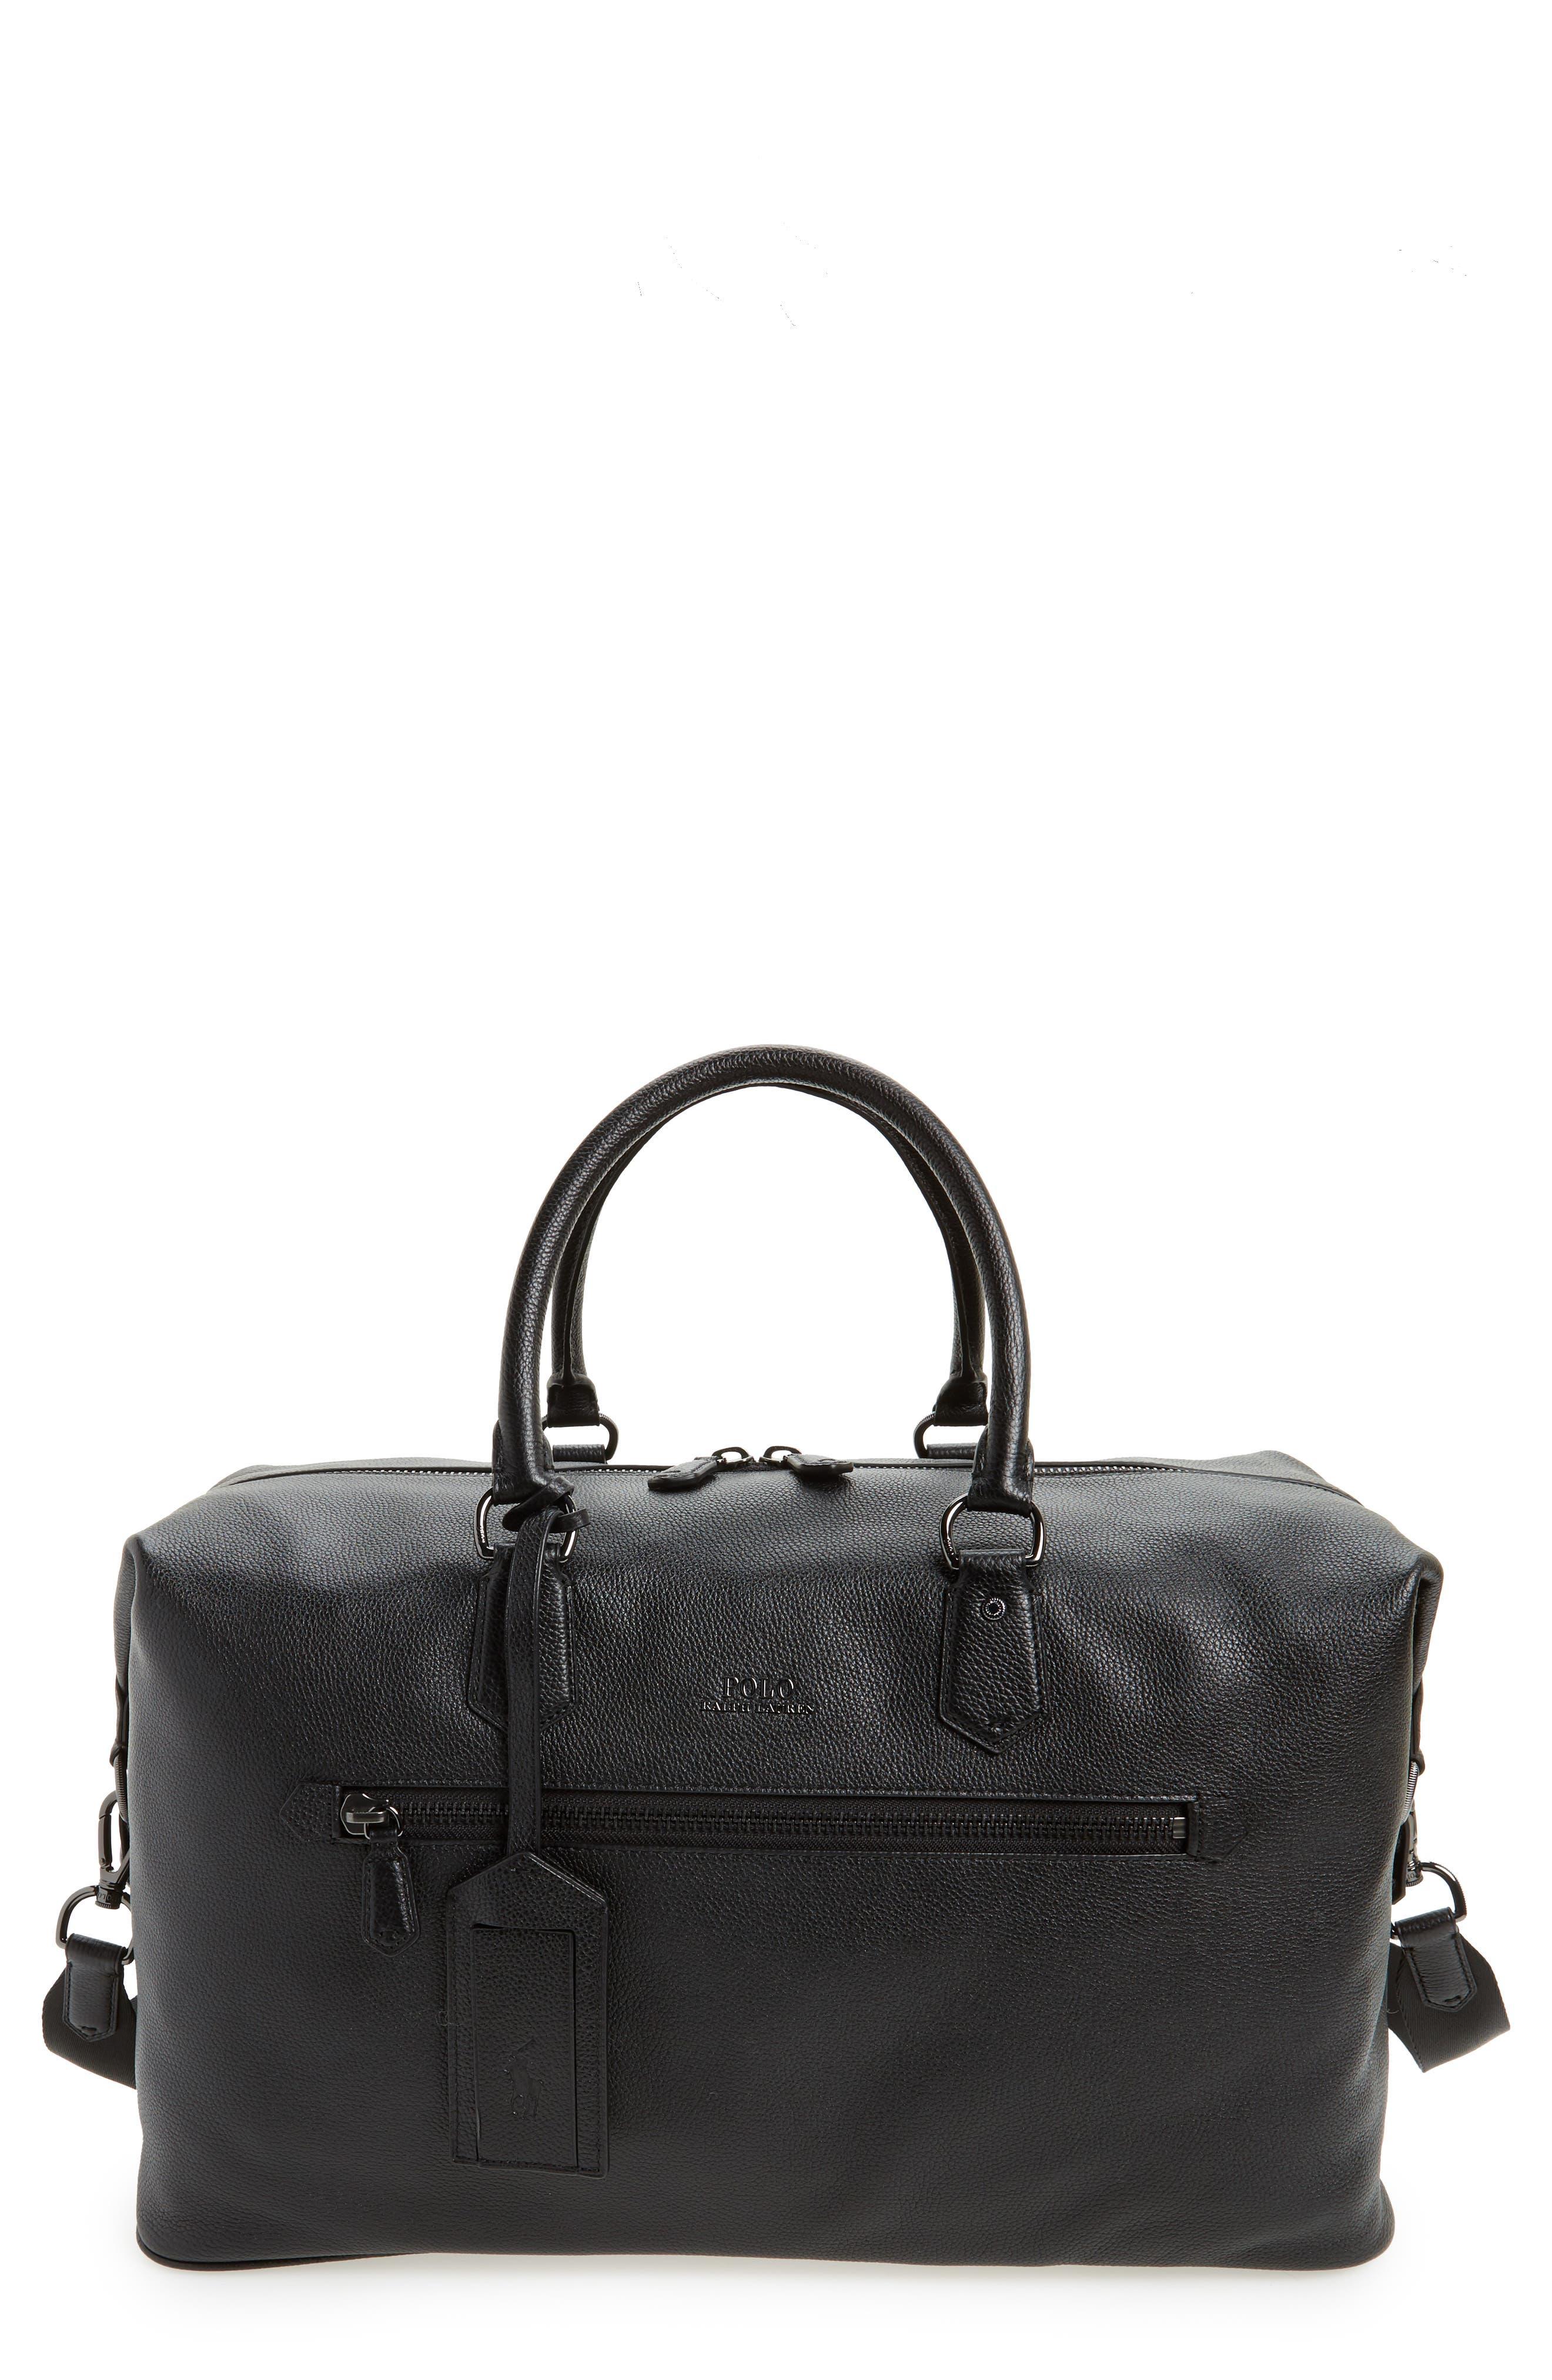 Main Image - Polo Ralph Lauren Pebbled Leather Duffel Bag